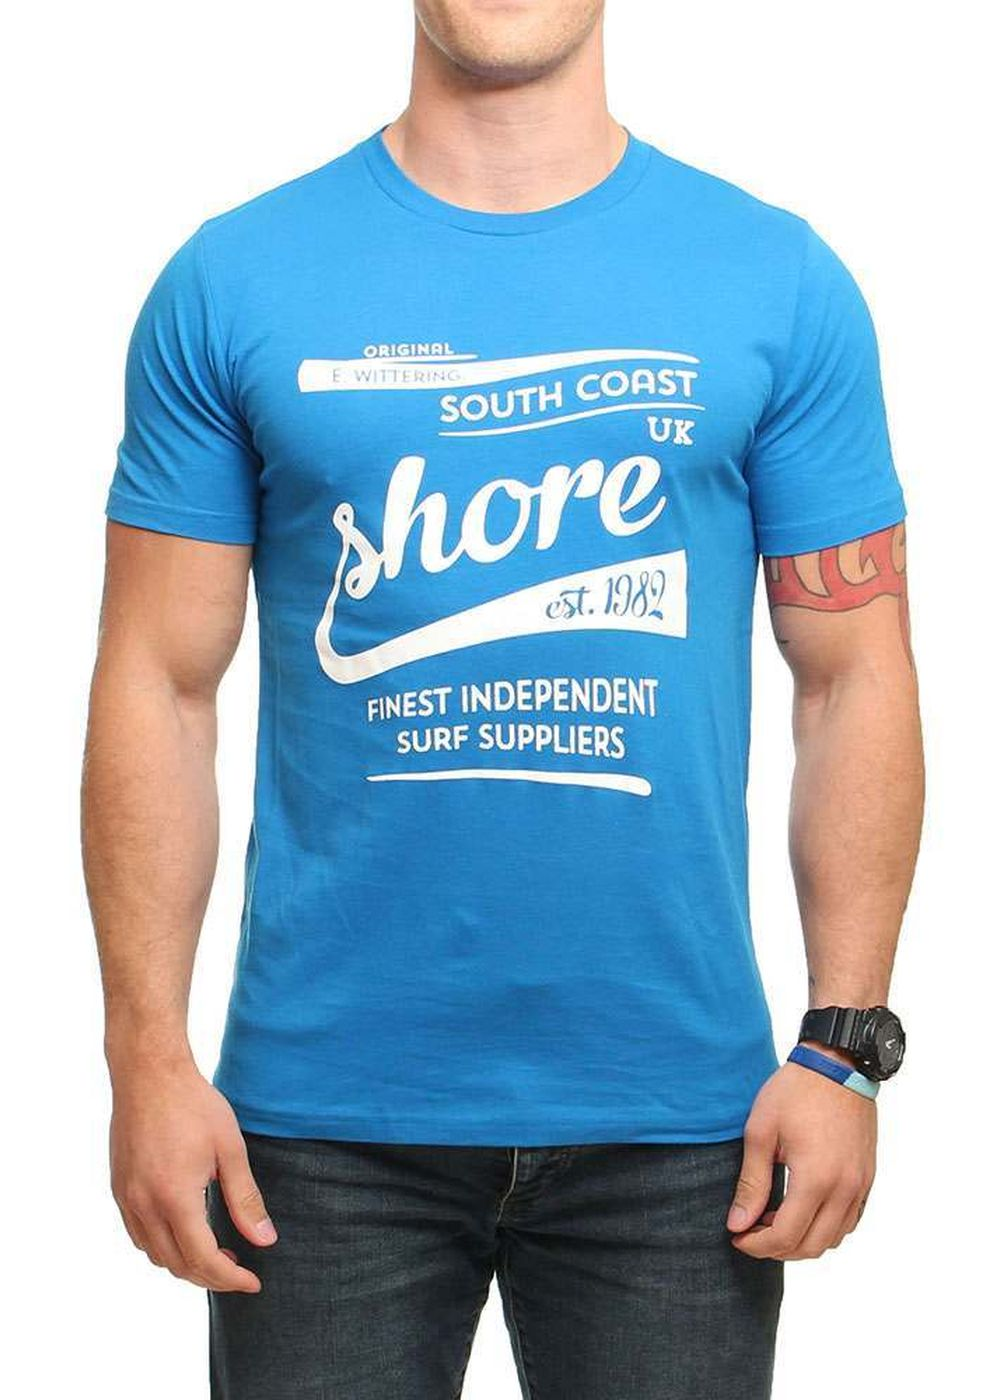 http://www.shore.co.uk/media/catalog/product/S/H/SHSCRPBLa.jpg